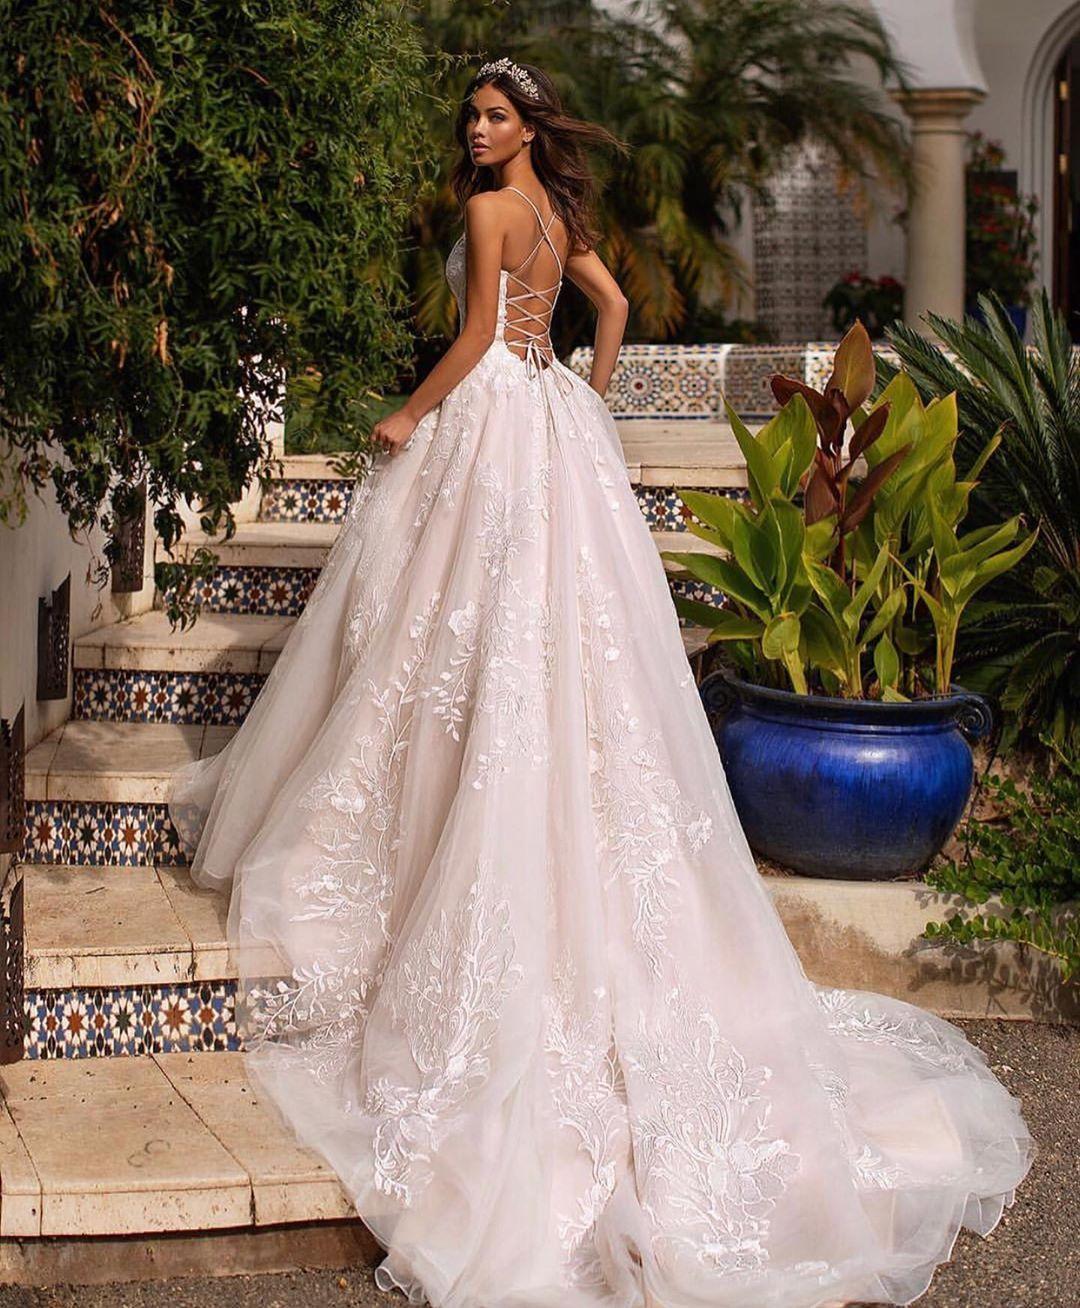 Luxebrideguide On Instagram Loving A Crisscross Back Moment Gown Moonlightbridal Style H1 Wedding Dresses Satin Wedding Dress Trends Dream Wedding Dresses